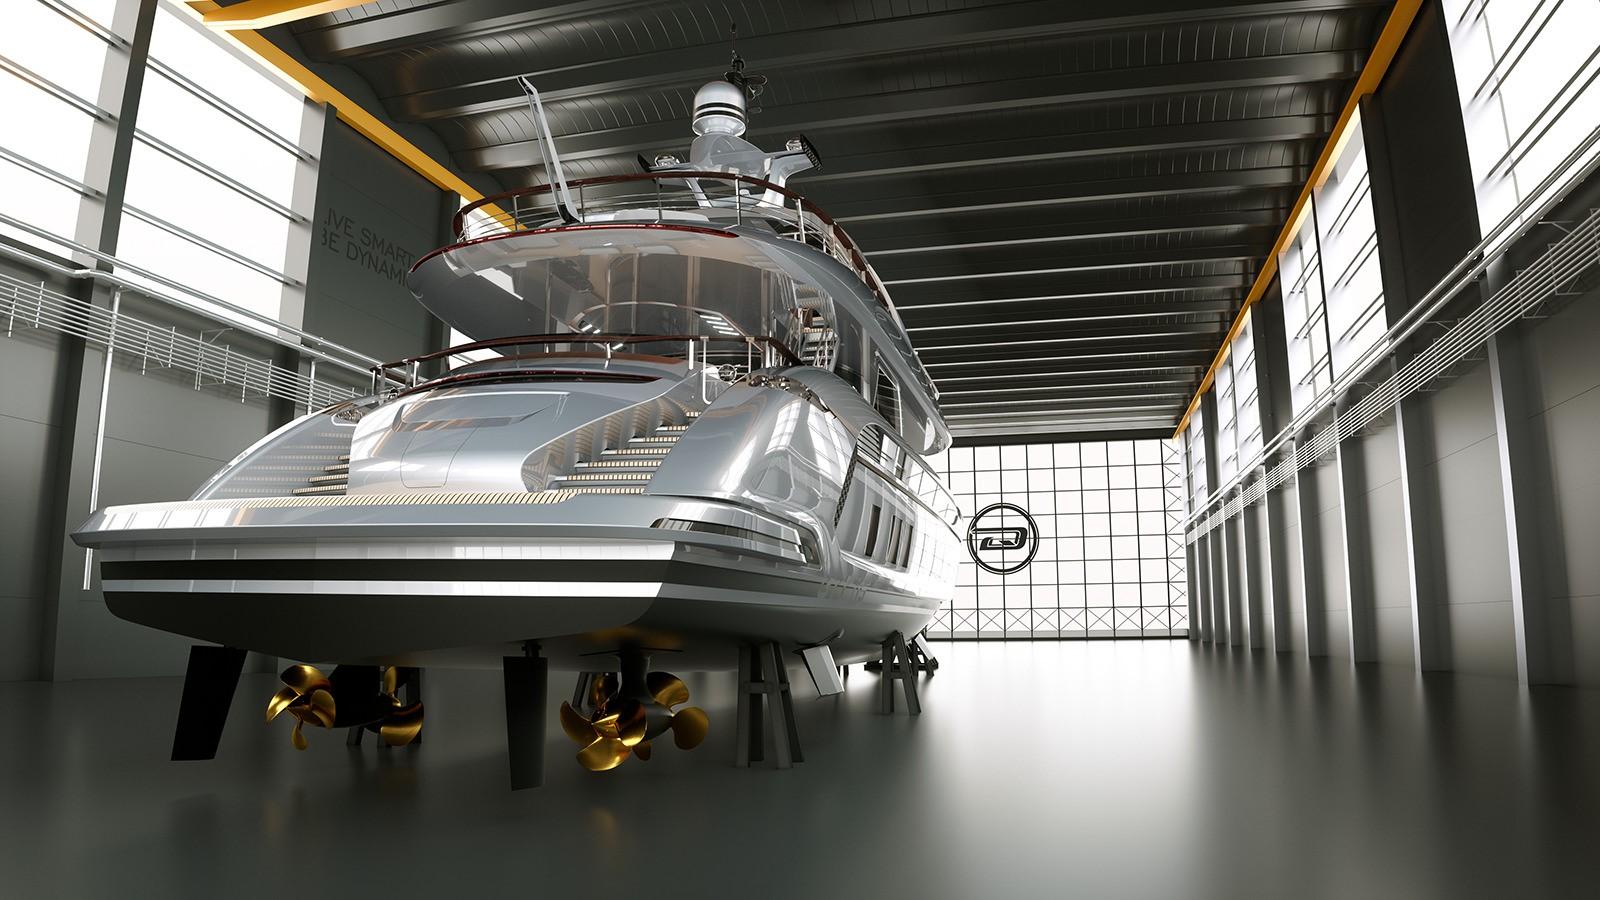 dynamiq-yacht-gtt-115-hybrid-hintenansicht-1